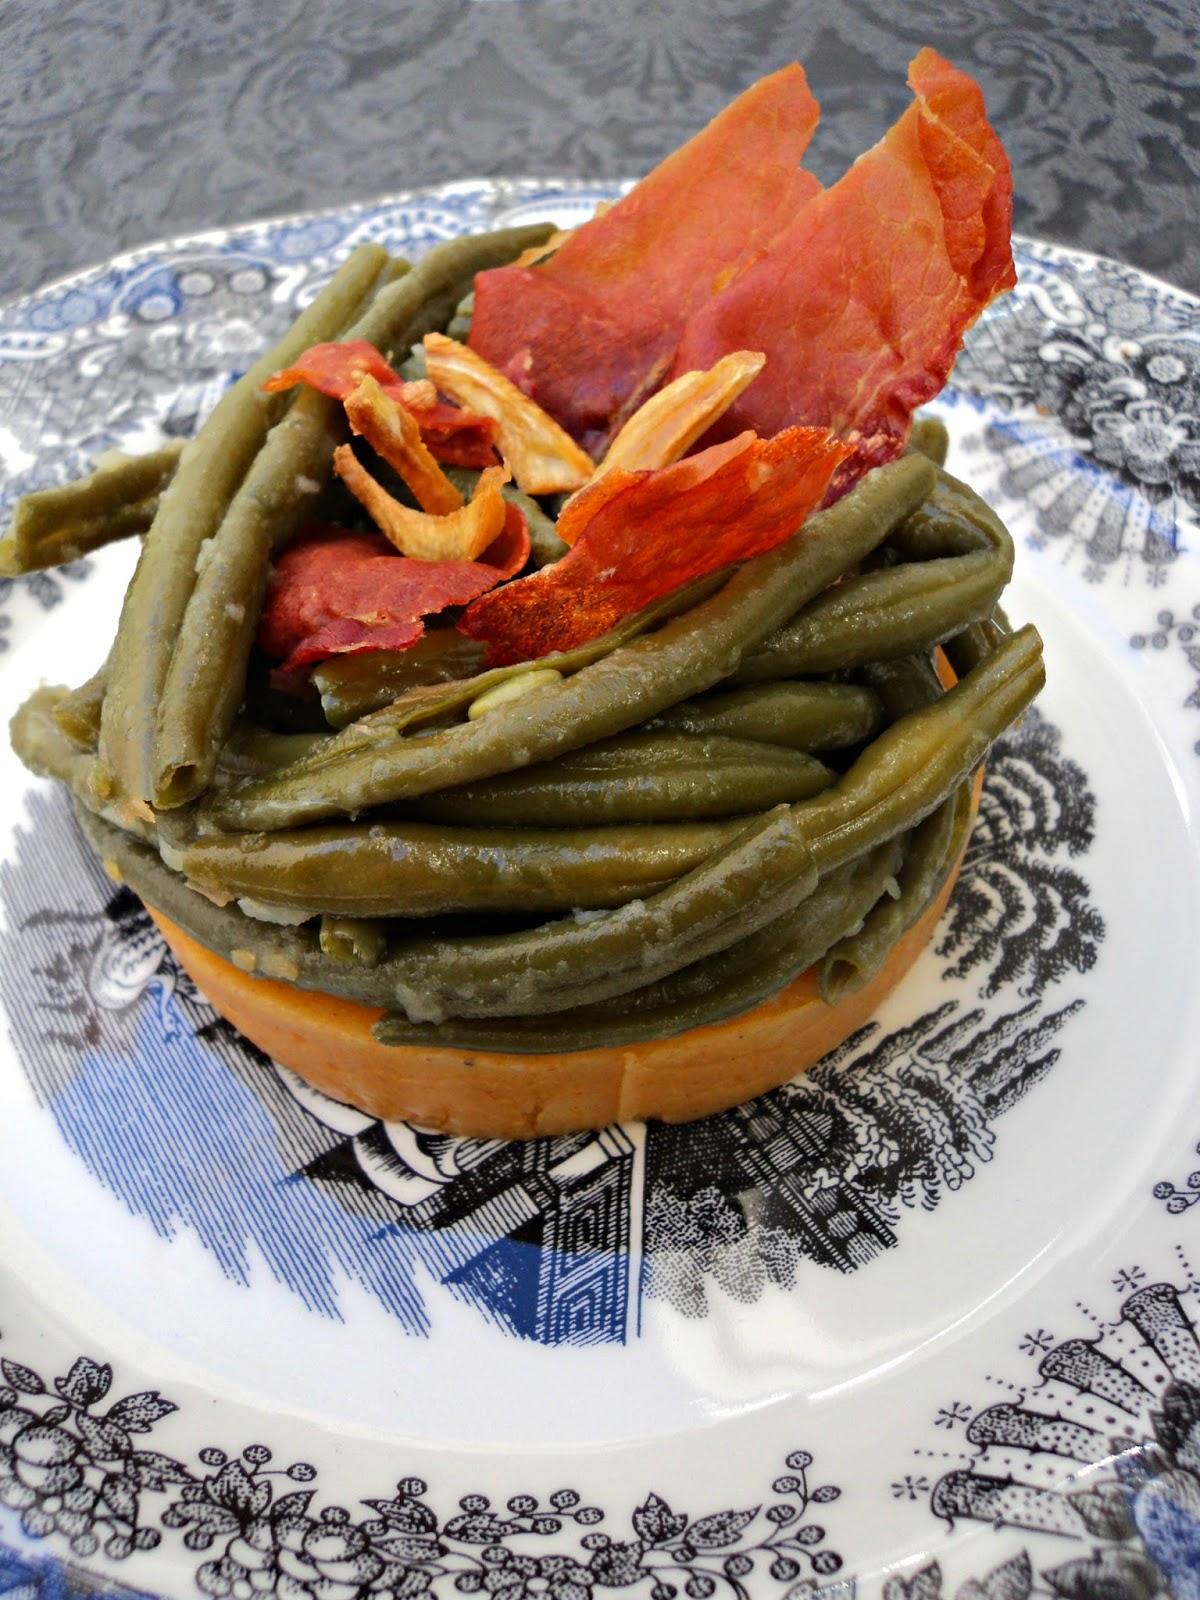 ensalada-templada-judias-verdes-pimenton-lado